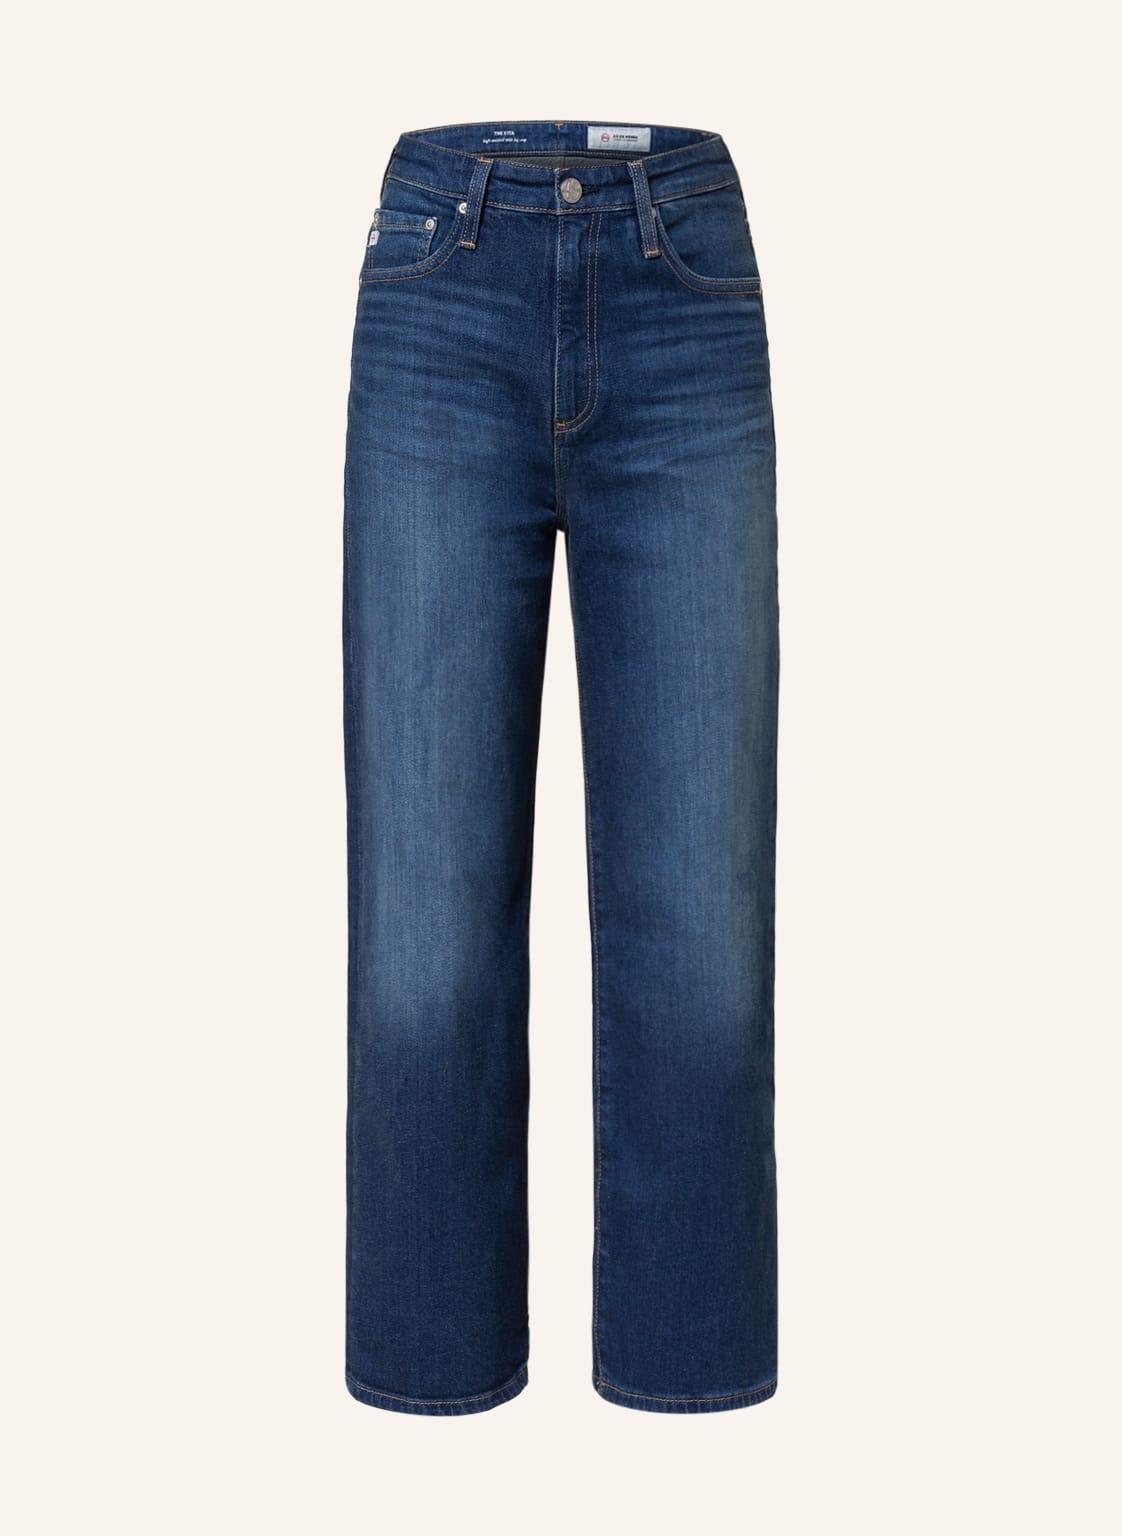 Image of Ag Jeans 7/8-Jeans The Etta blau